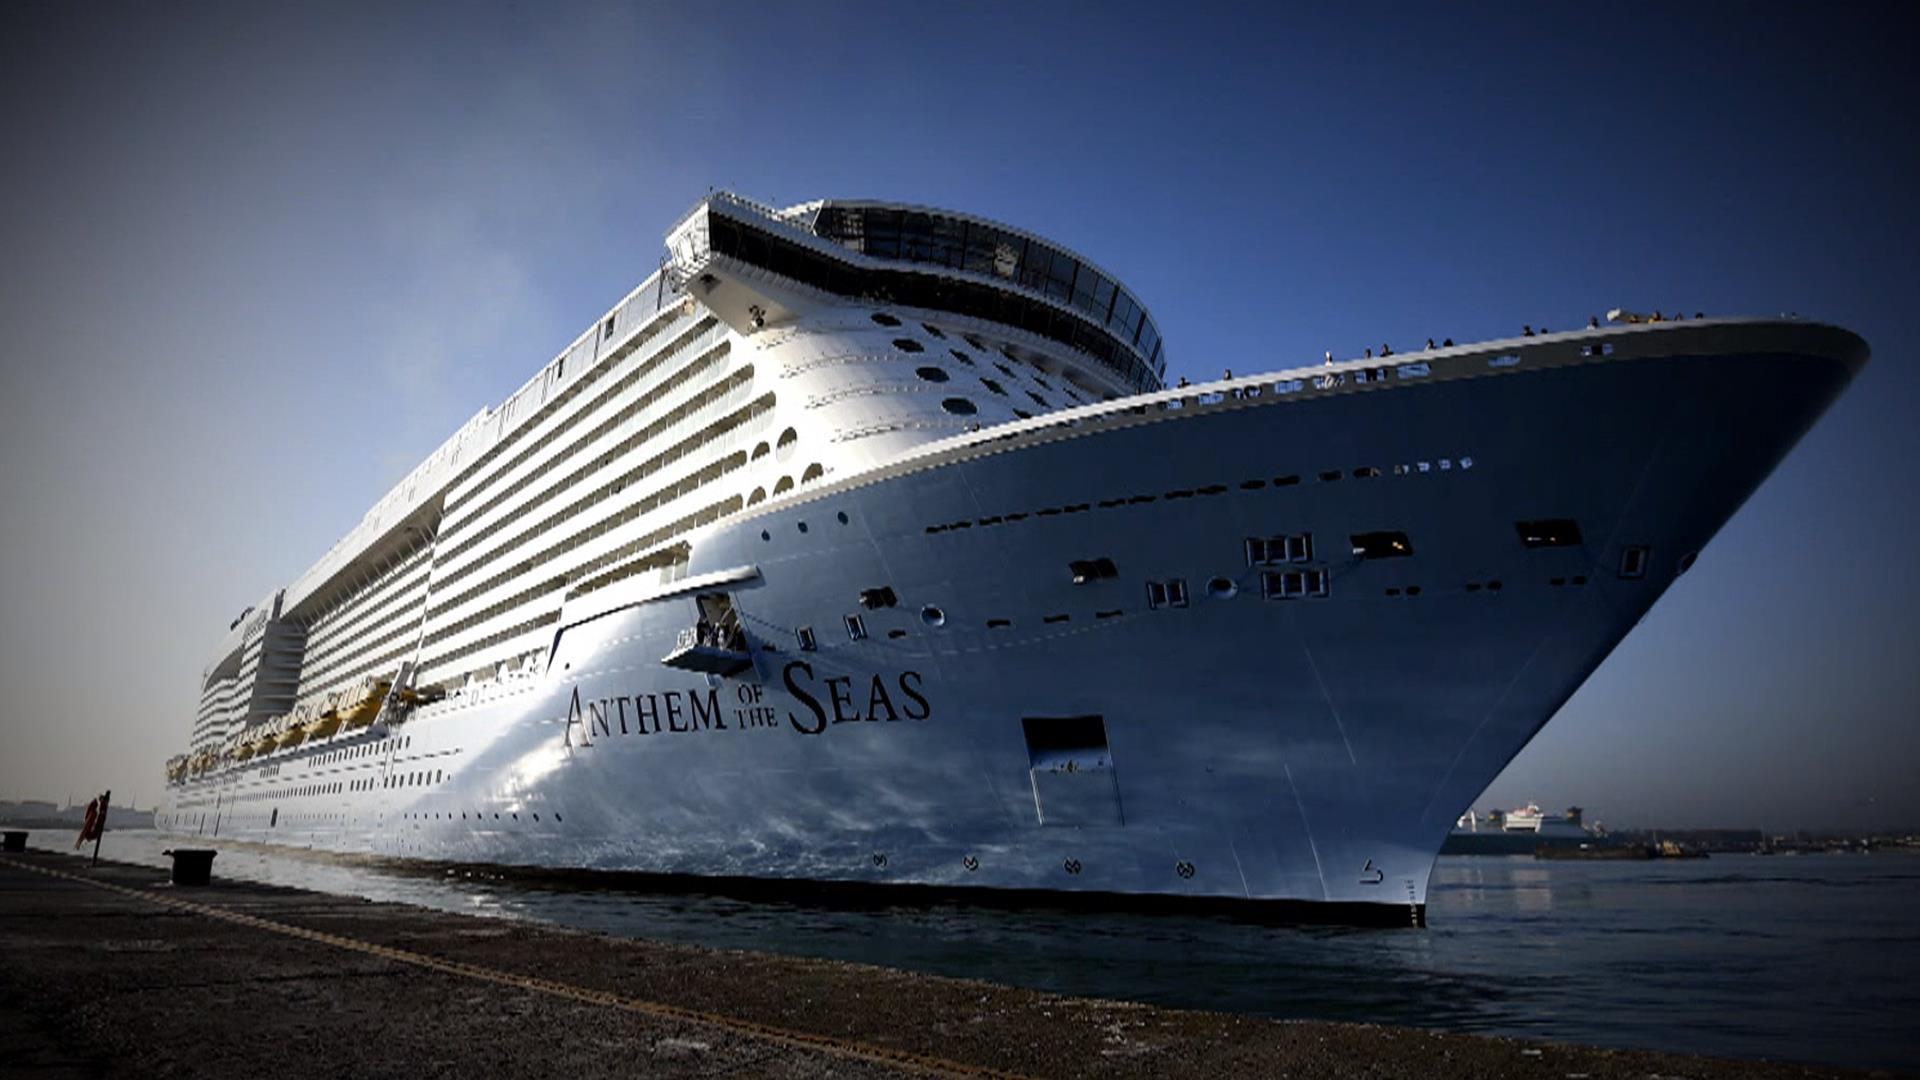 Nightclub Floor Plan Lure Of The Seas Cruise Ship Fitbudha Com